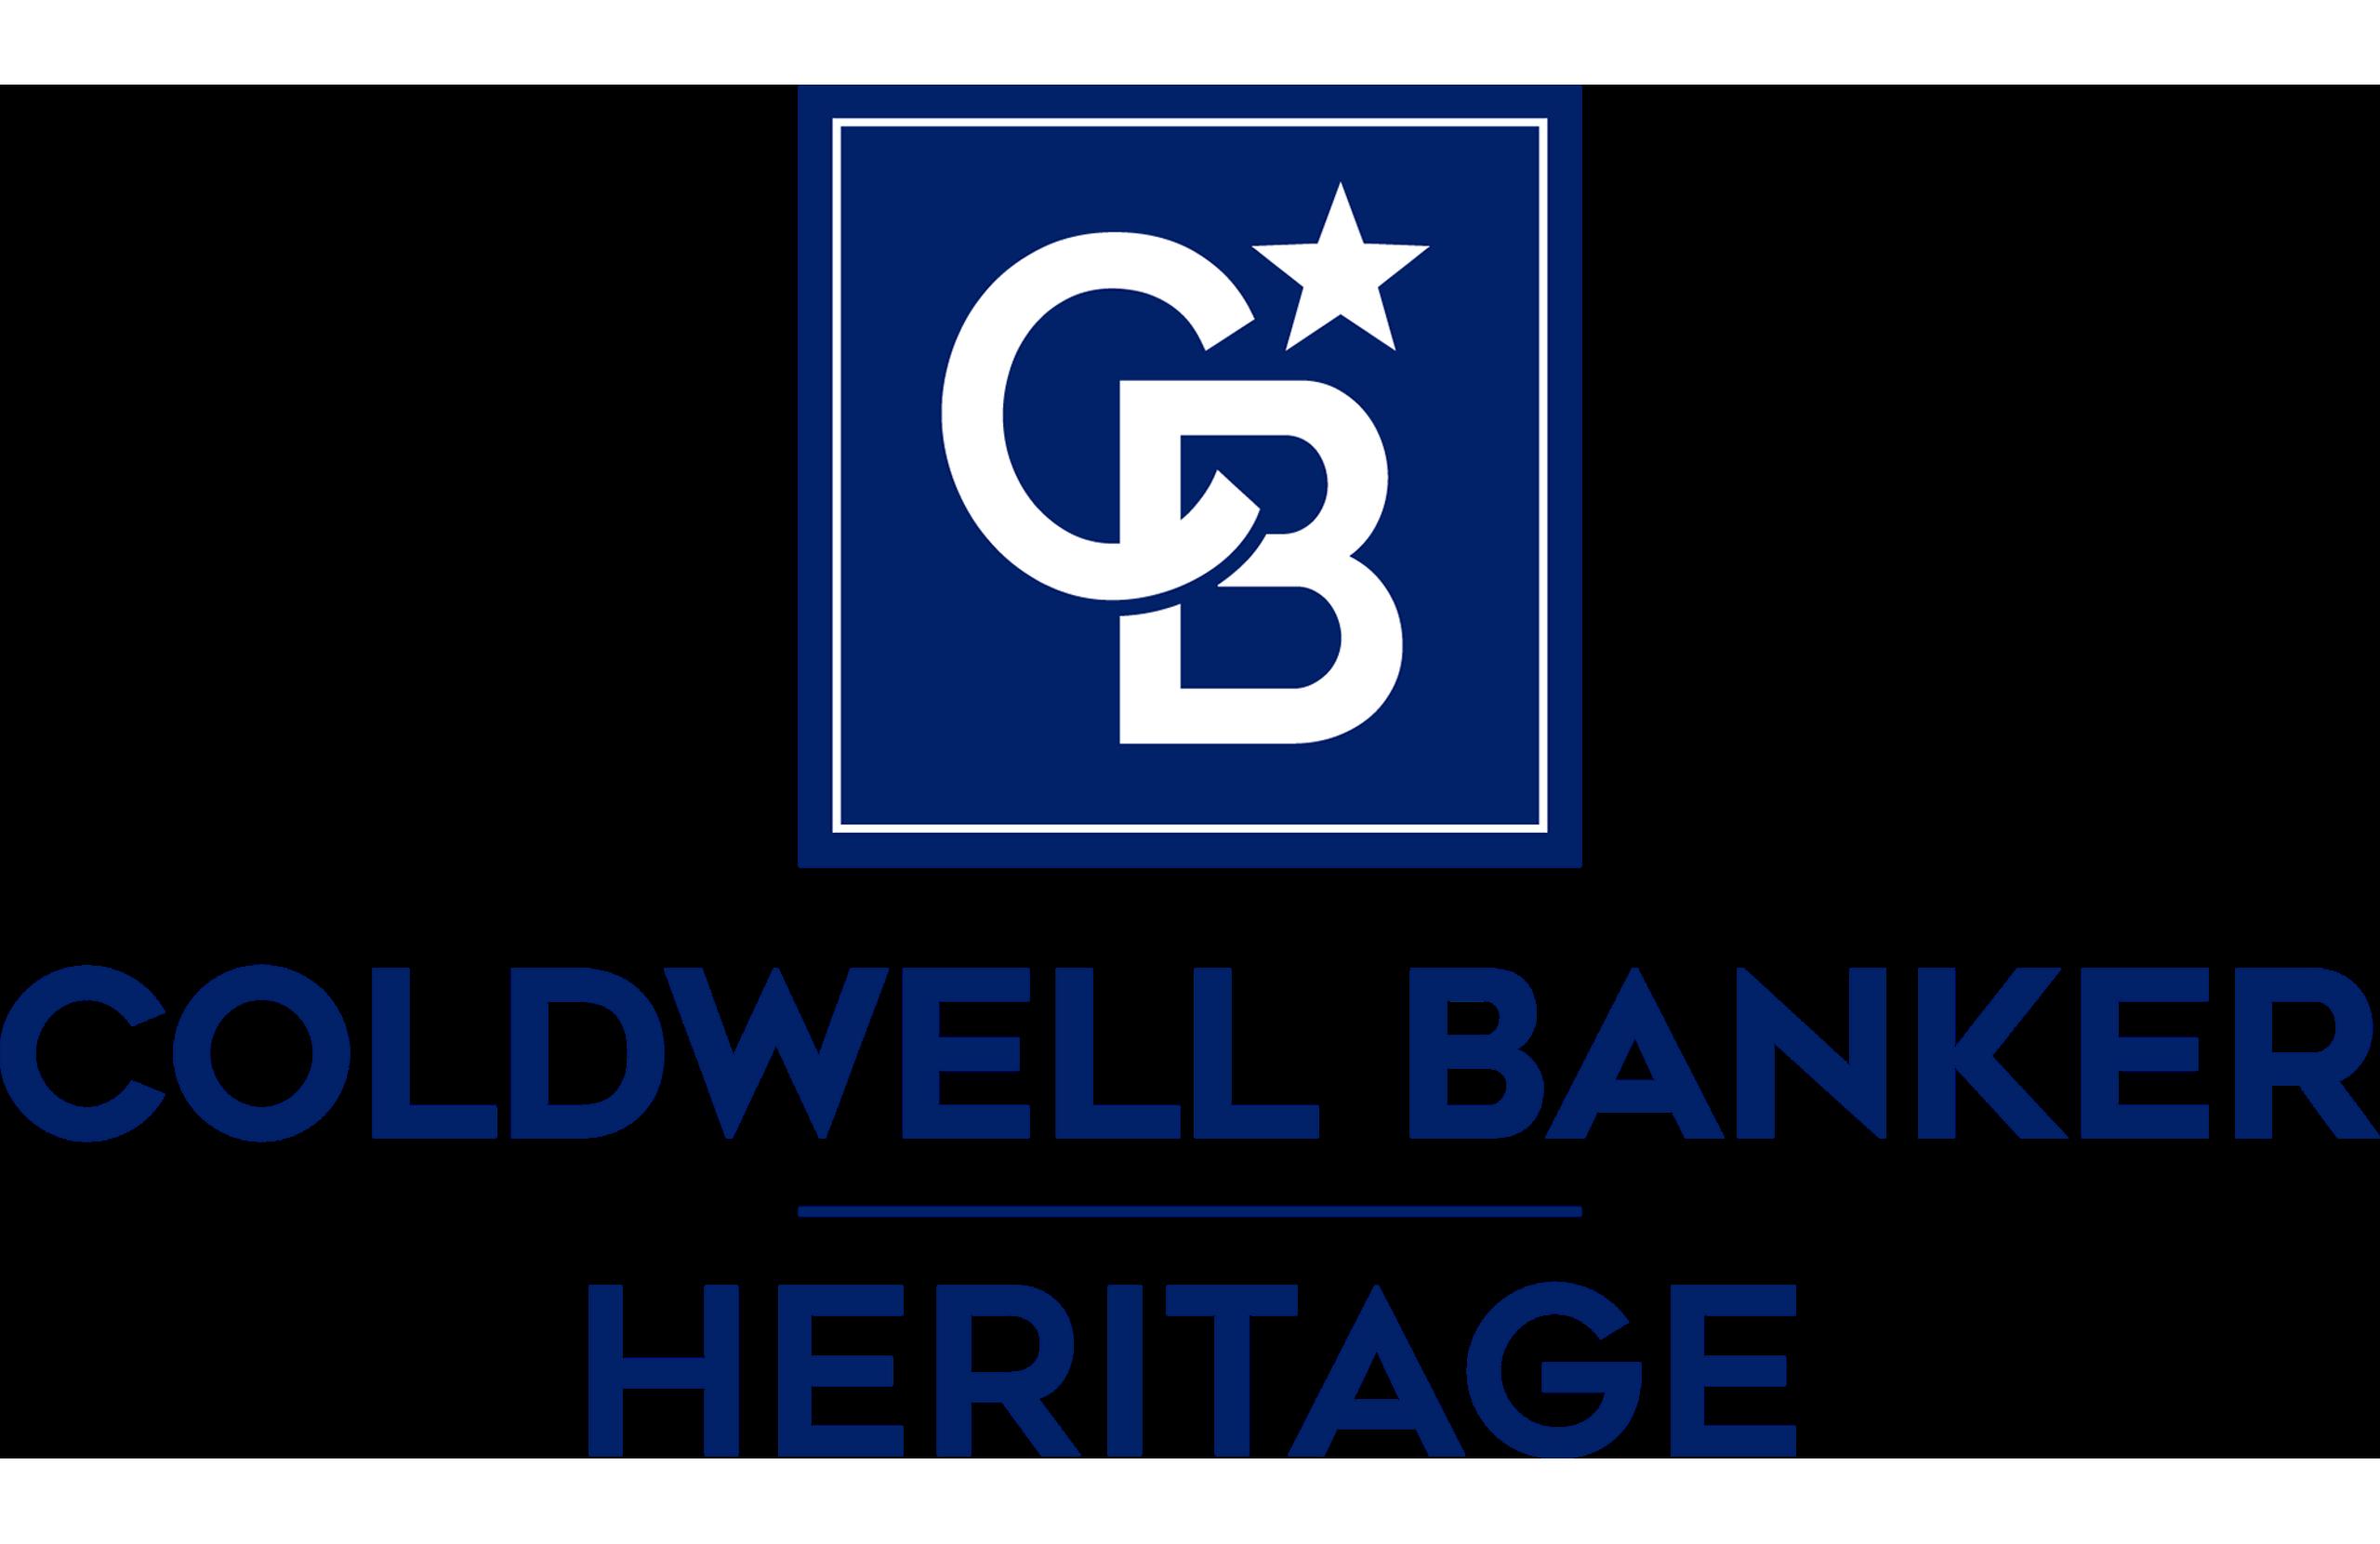 Stefan Wannemacher - Coldwell Banker Heritage Logo